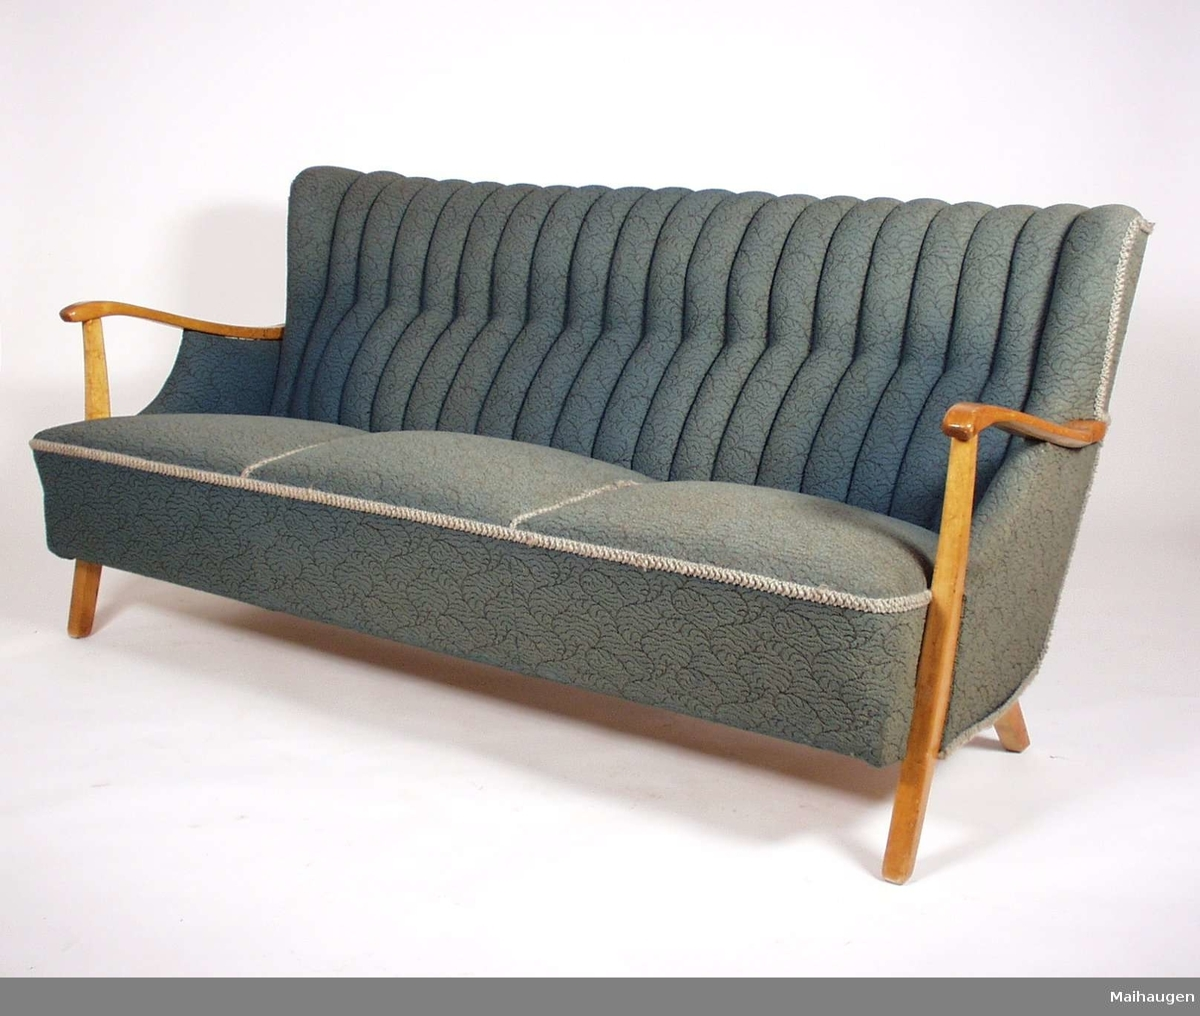 Sofa - Maihaugen / DigitaltMuseum